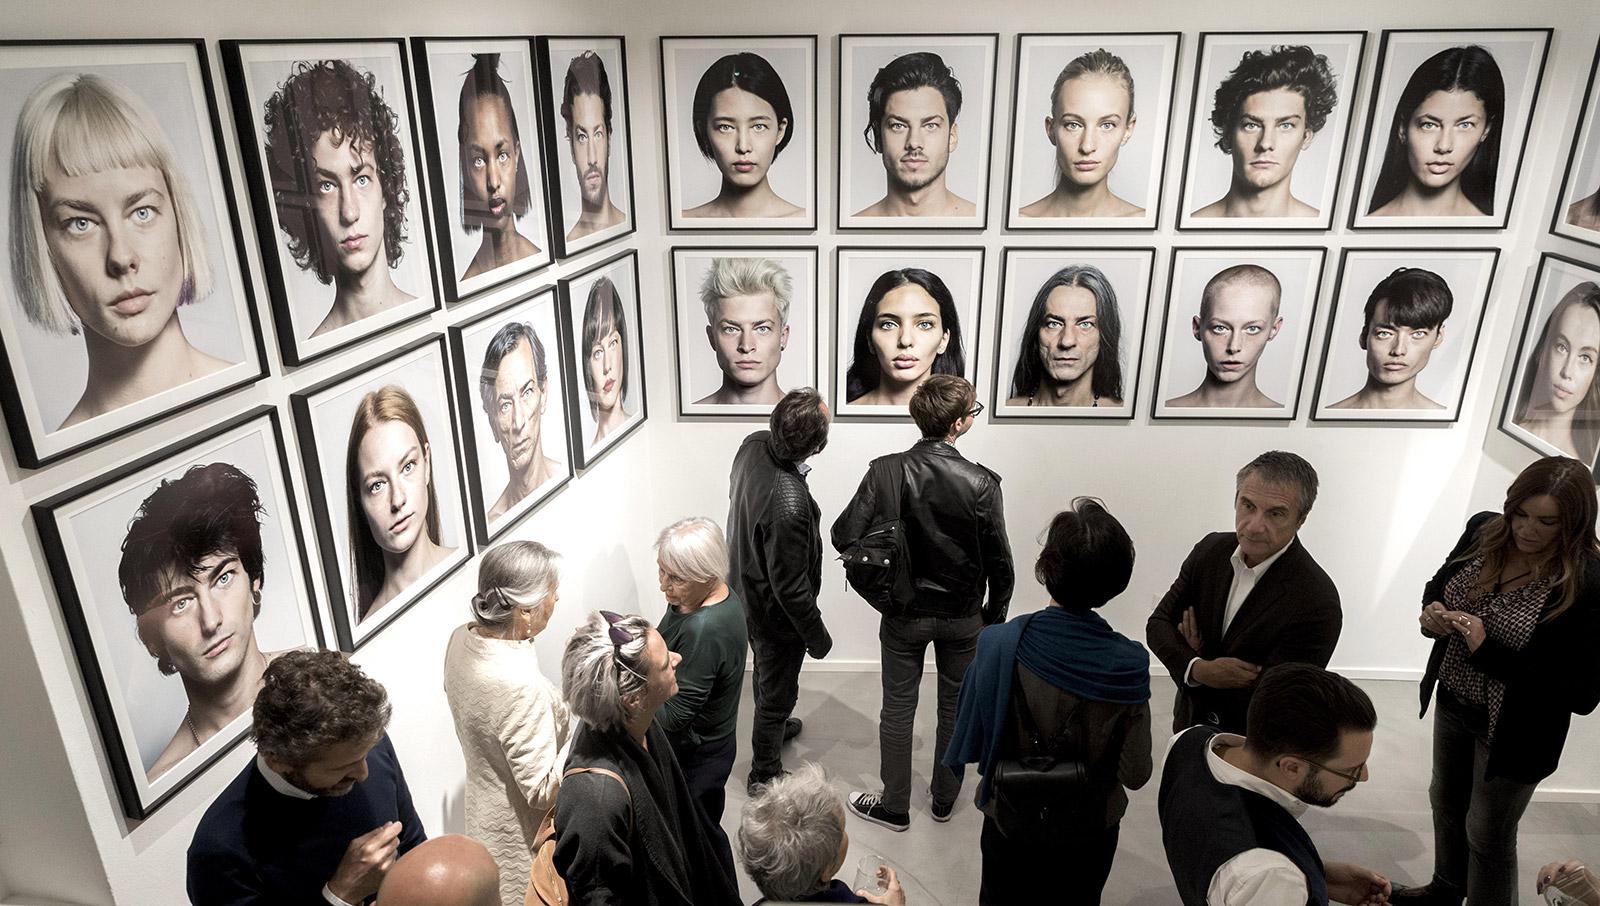 Giuseppe Mastromatteo Humanscape 29 ARTS IN PROGRESS gallery